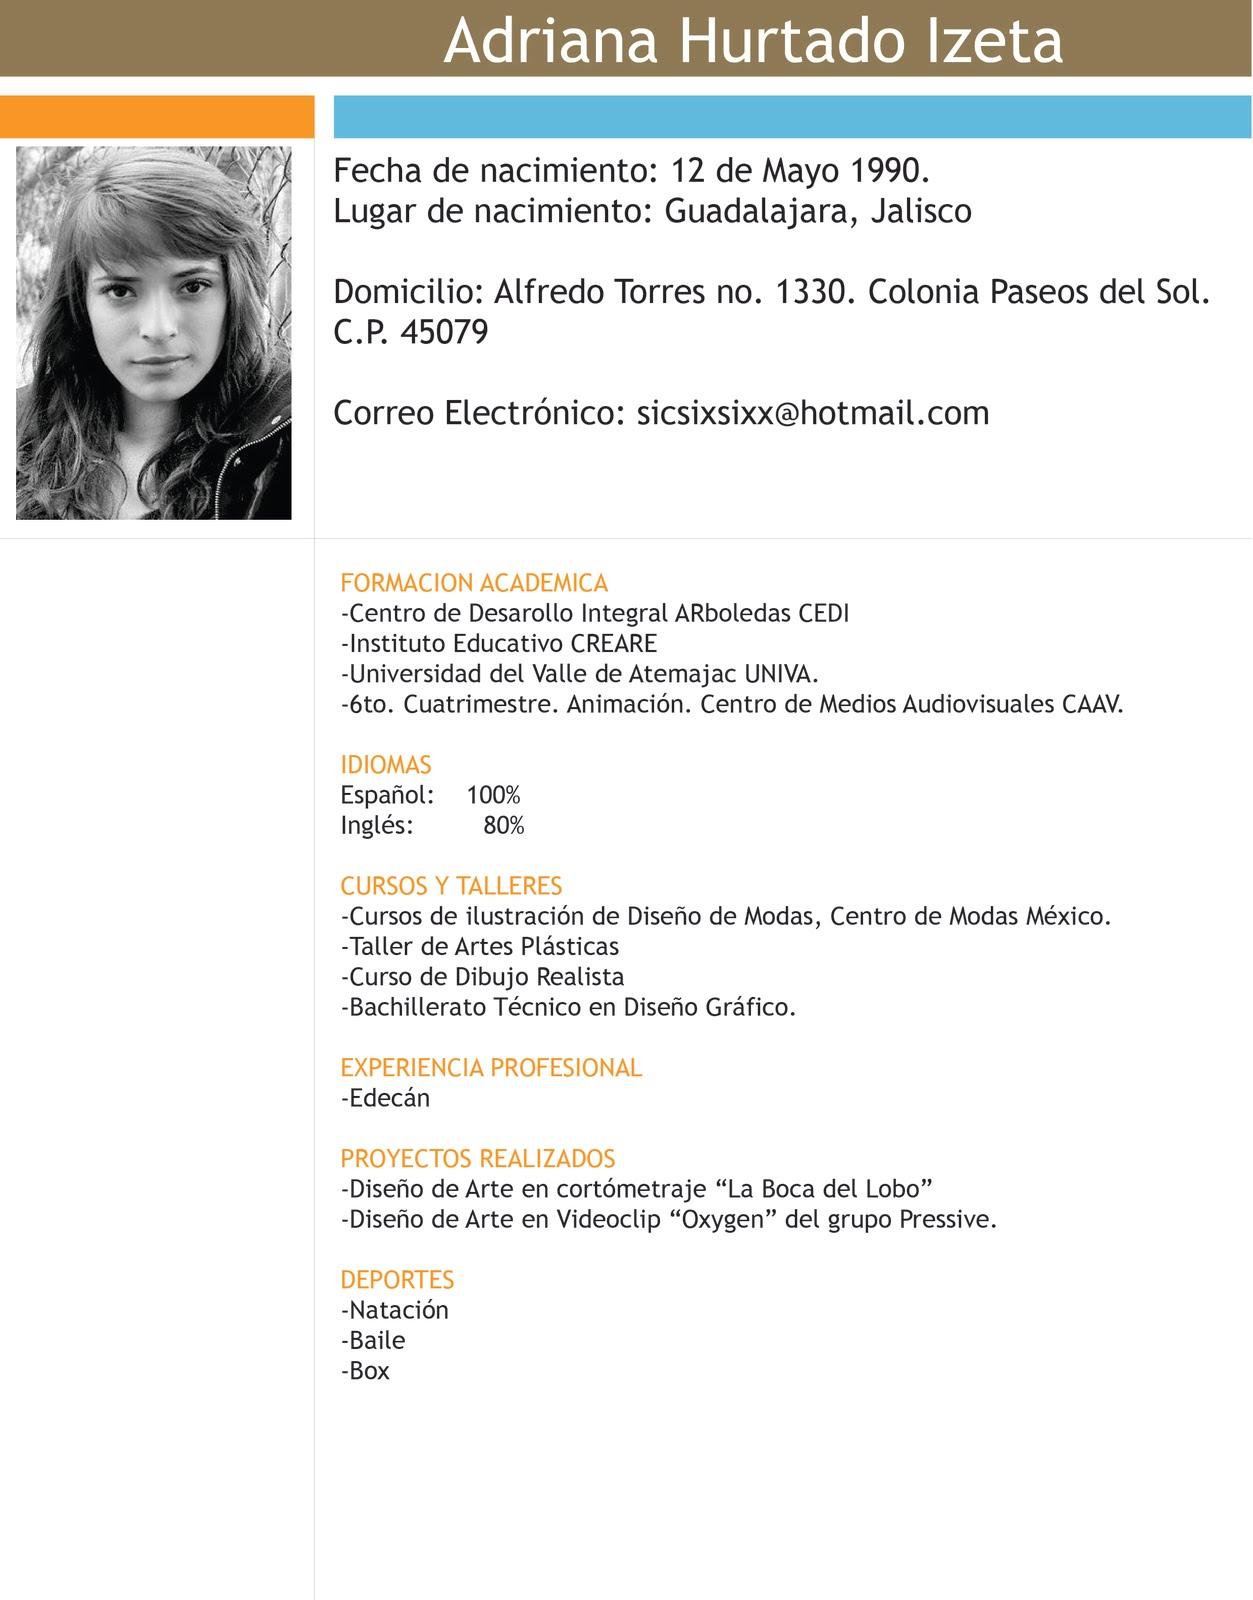 Elmentos de un Curriculum Vitae (Ejemplo) - MindMeister